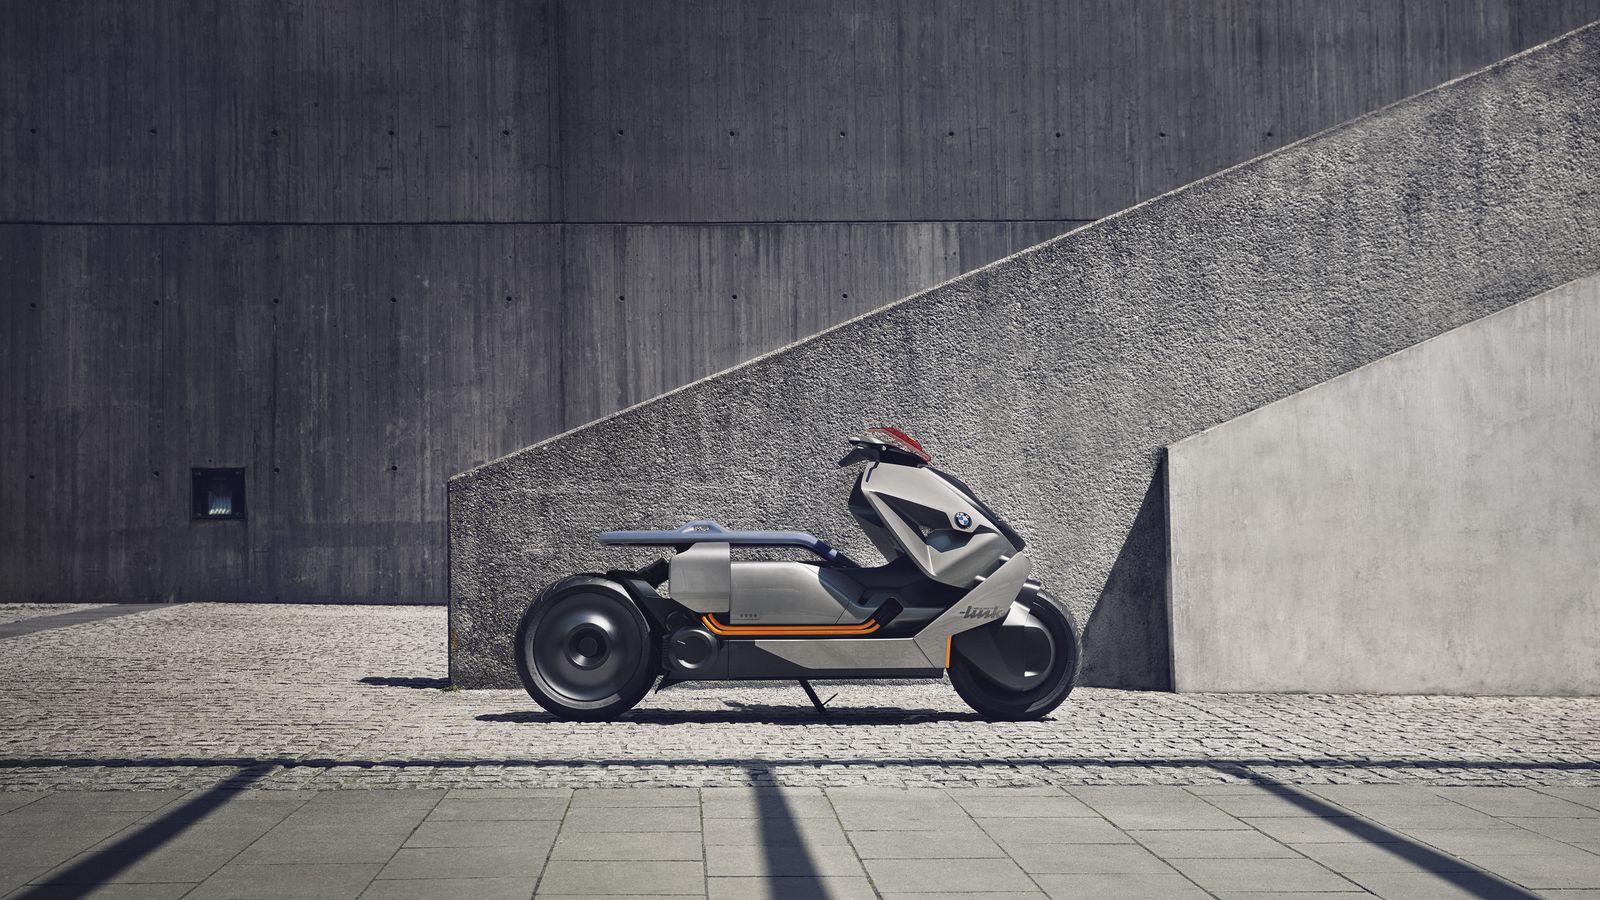 P90260577 highres bmw motorrad concept.0